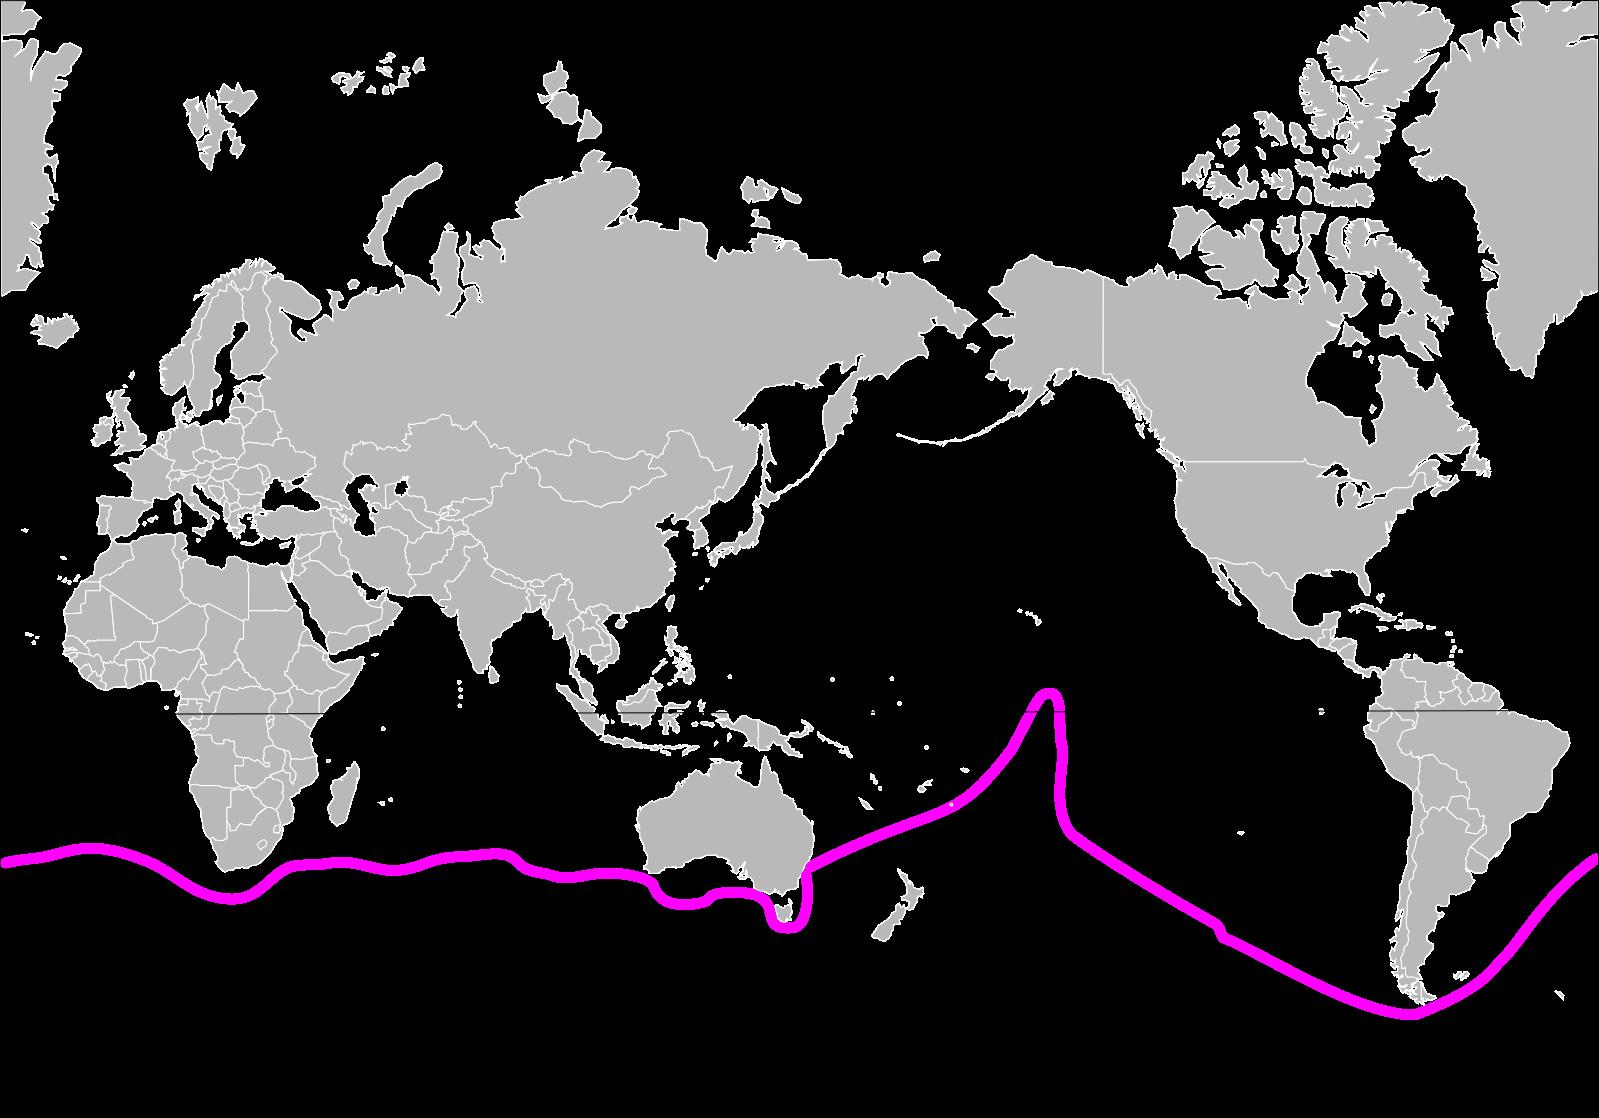 Jessica Watson's route around the world